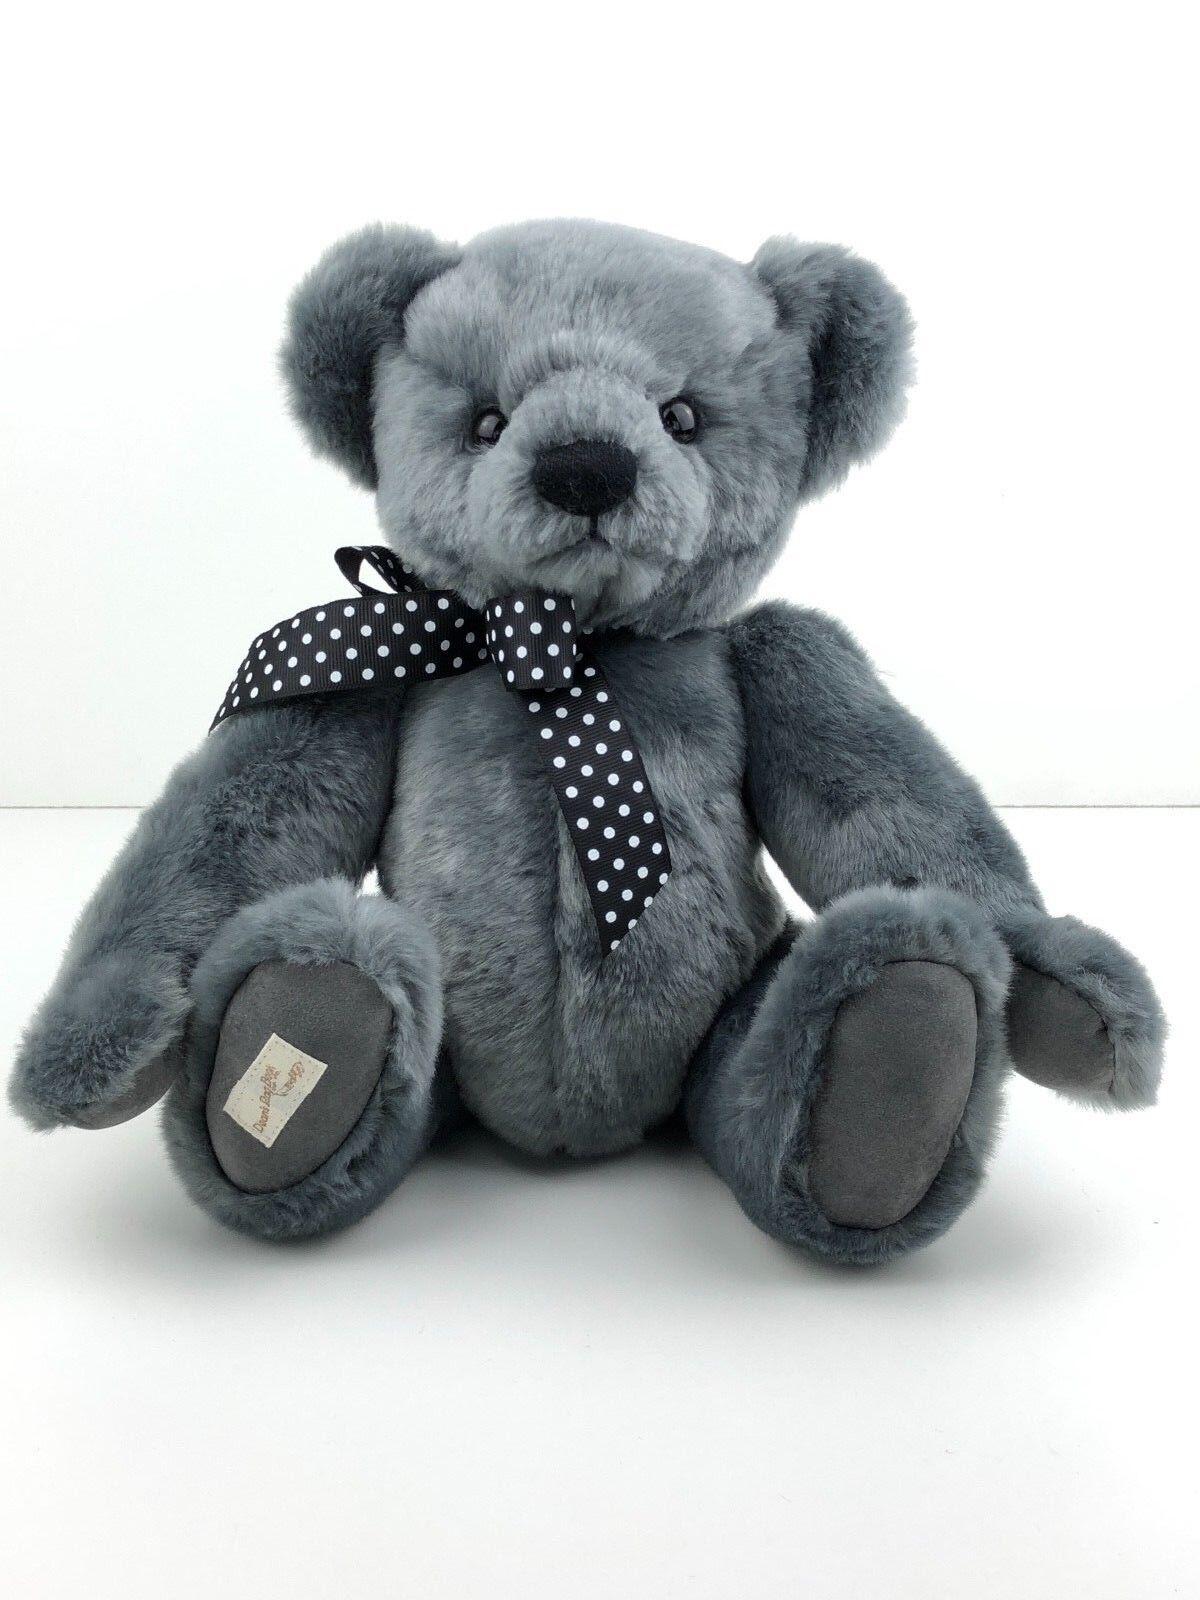 Dean's Teddy Dexter 14  Limited Edition Plush